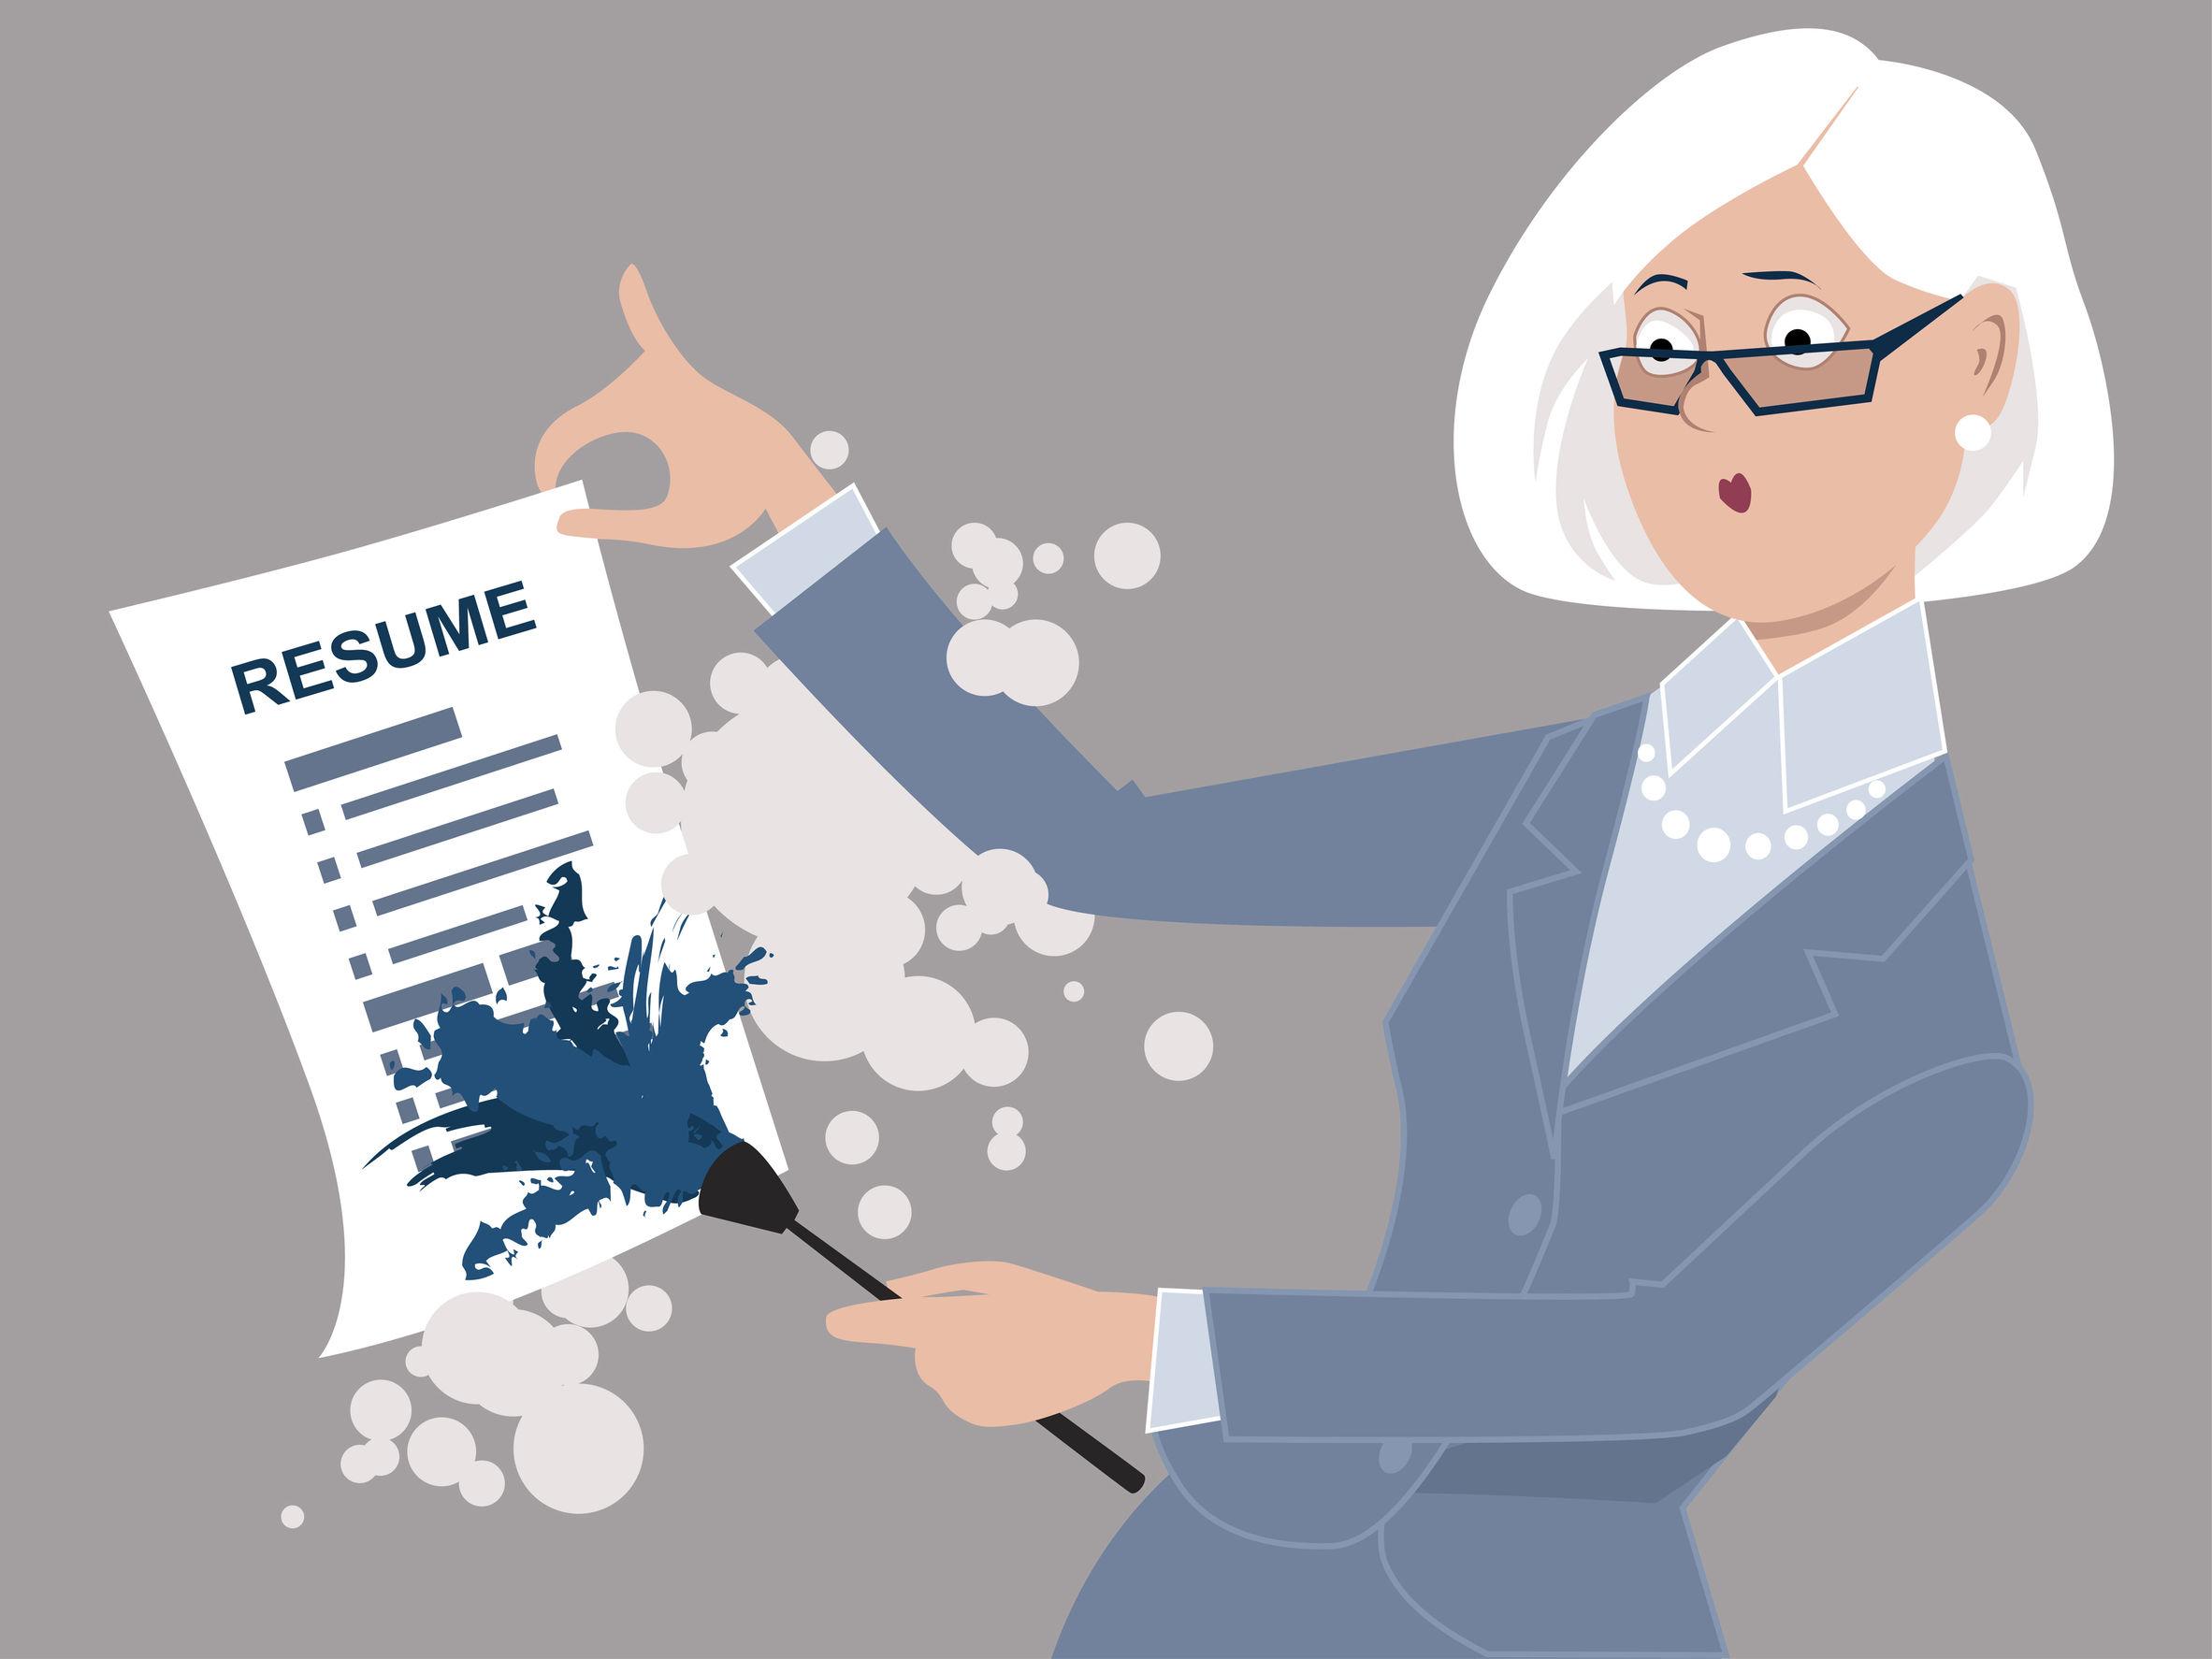 dusting-old-resume